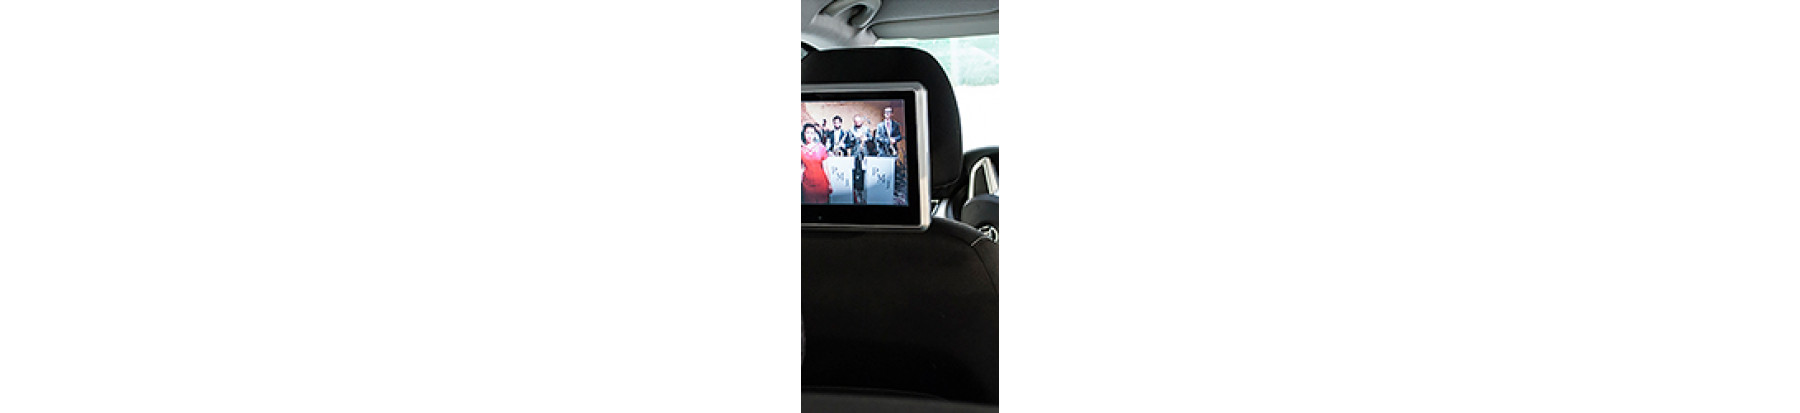 Телевизоры для авто